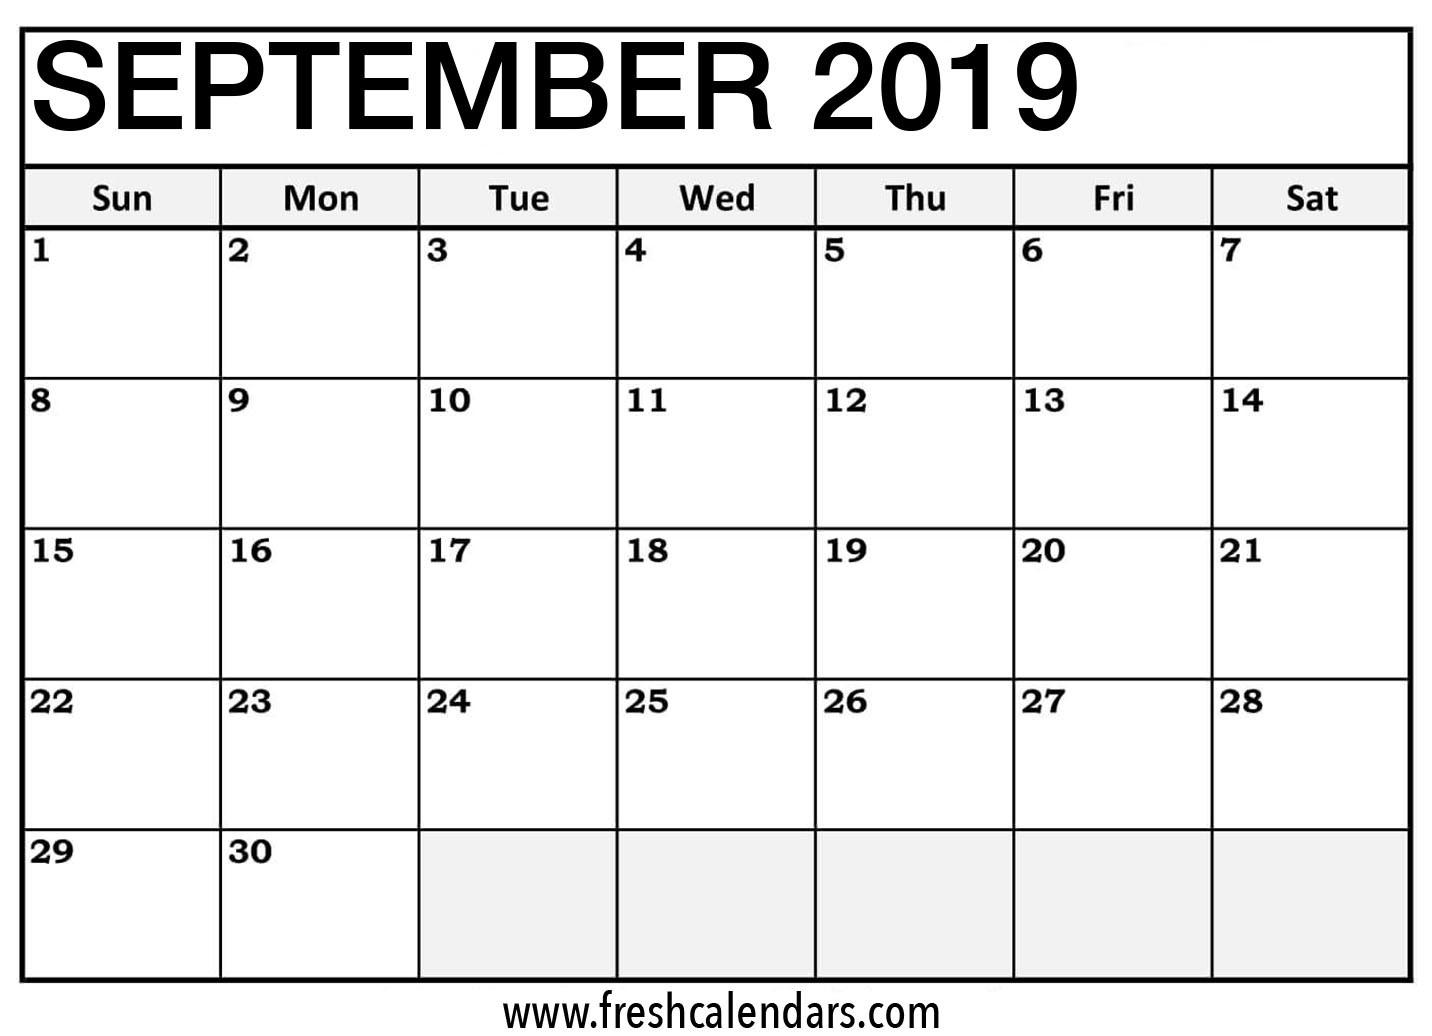 September 2019 Printable Calendar with Holidays